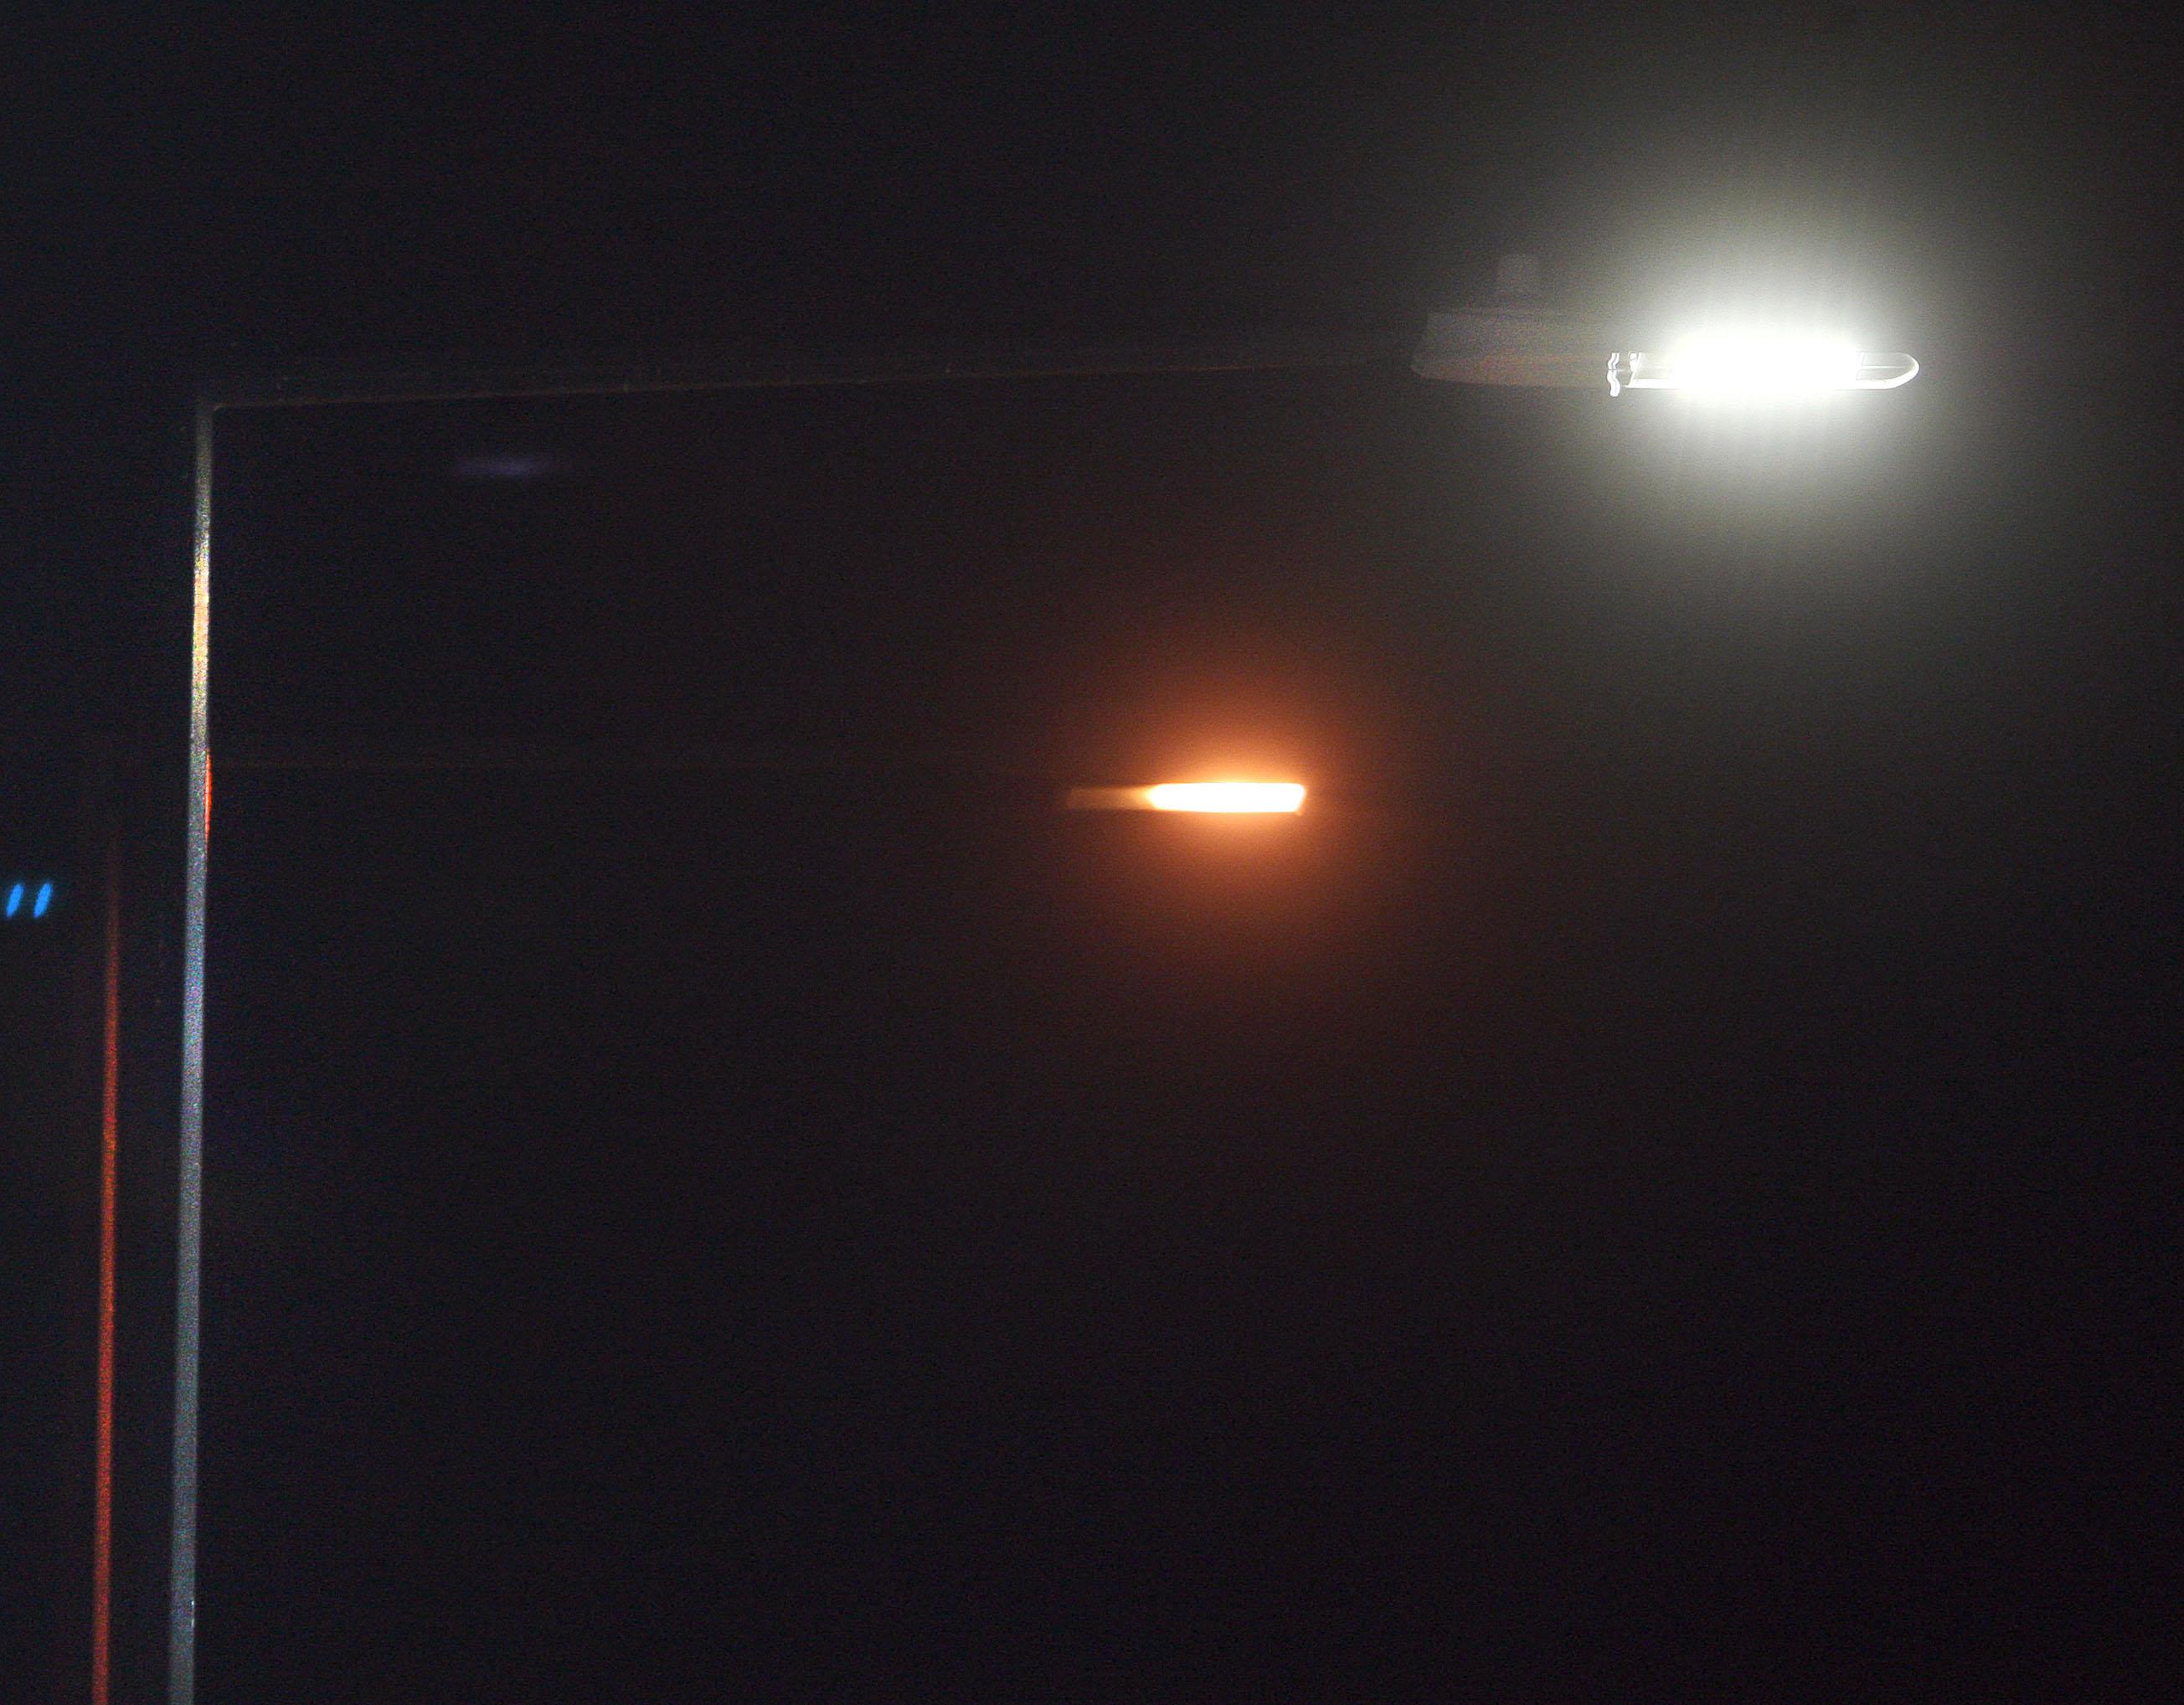 leds light pollution solution or sky nemesis